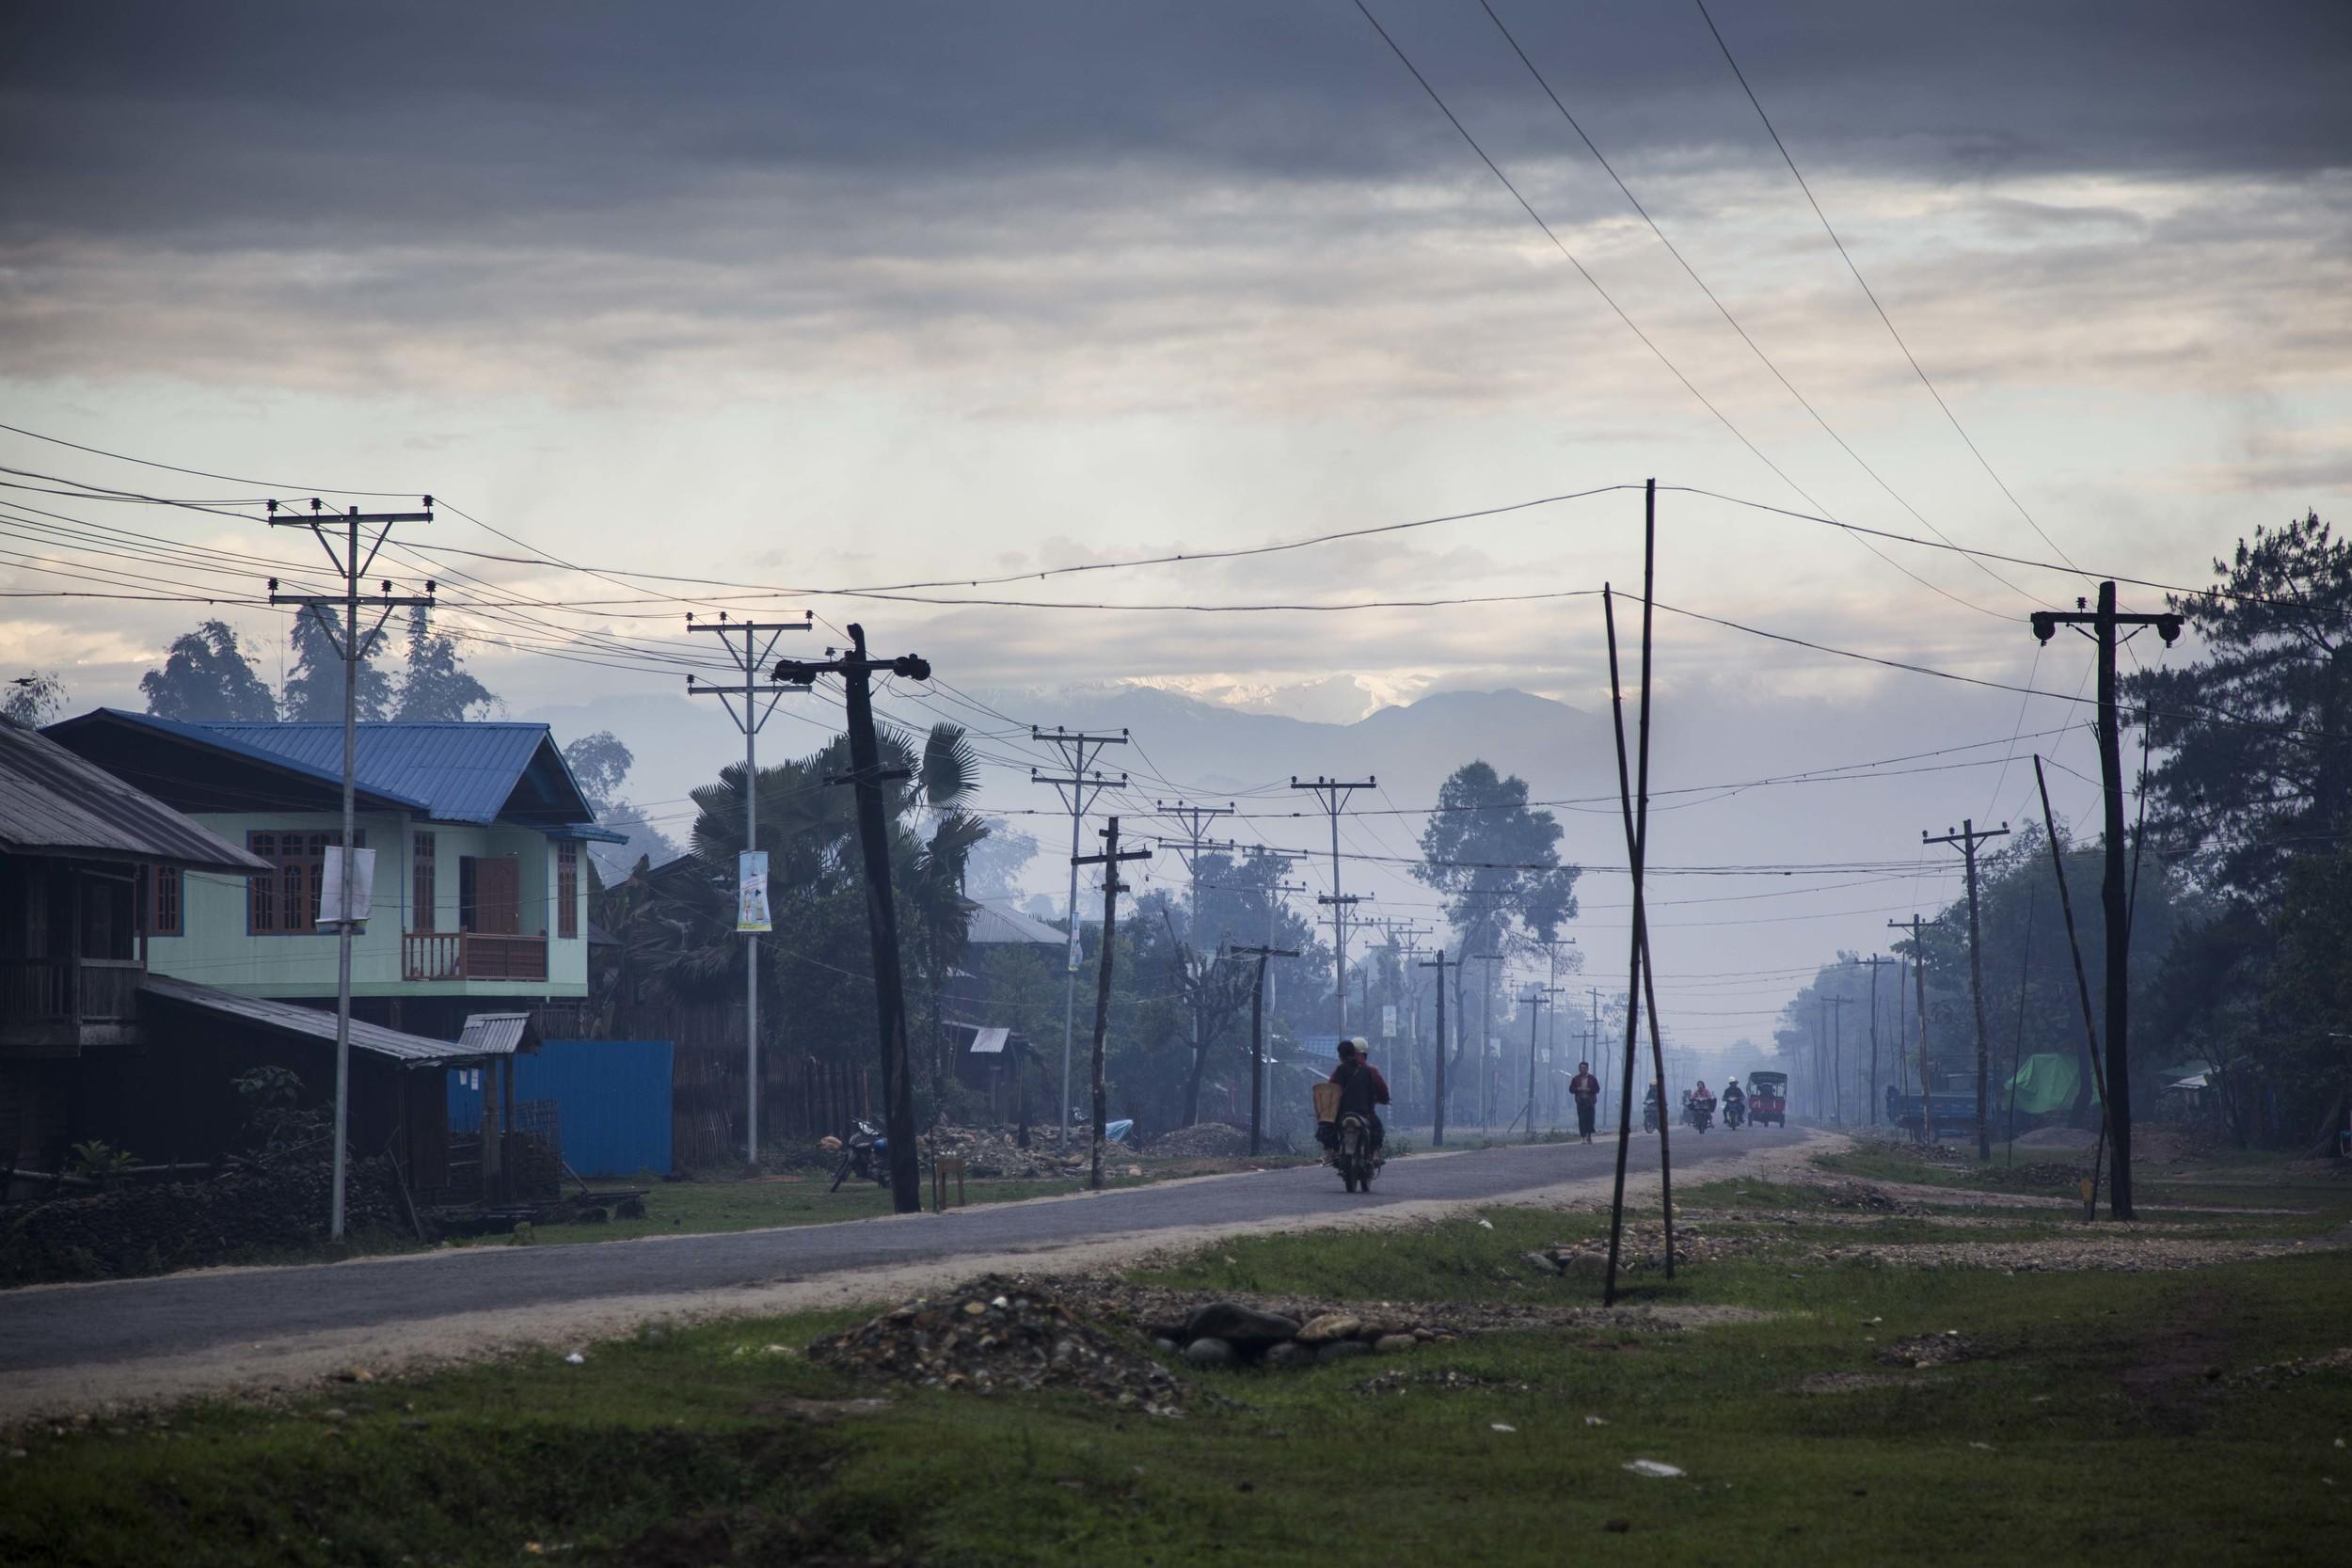 Putao, Kachin state, Myanmar. Photo by Ann Wang